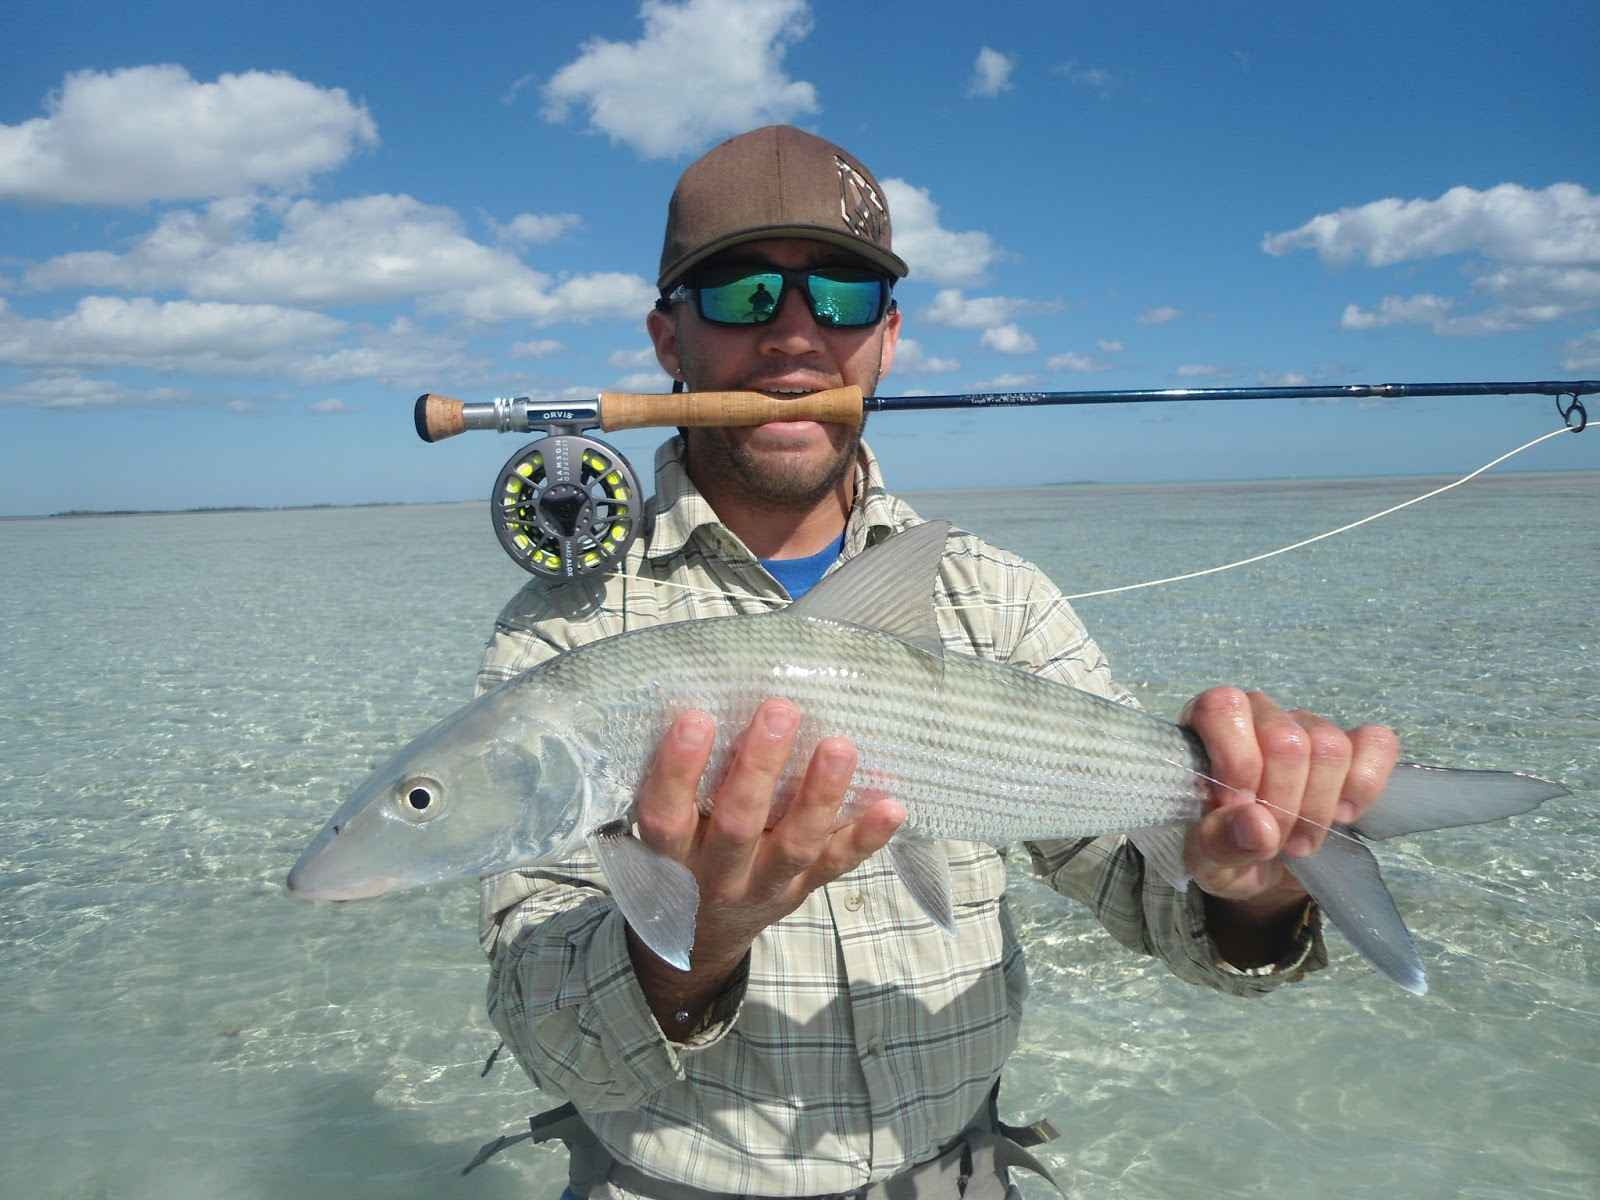 Small hope bay lodge andros island bahamas the for Fishing in the bahamas